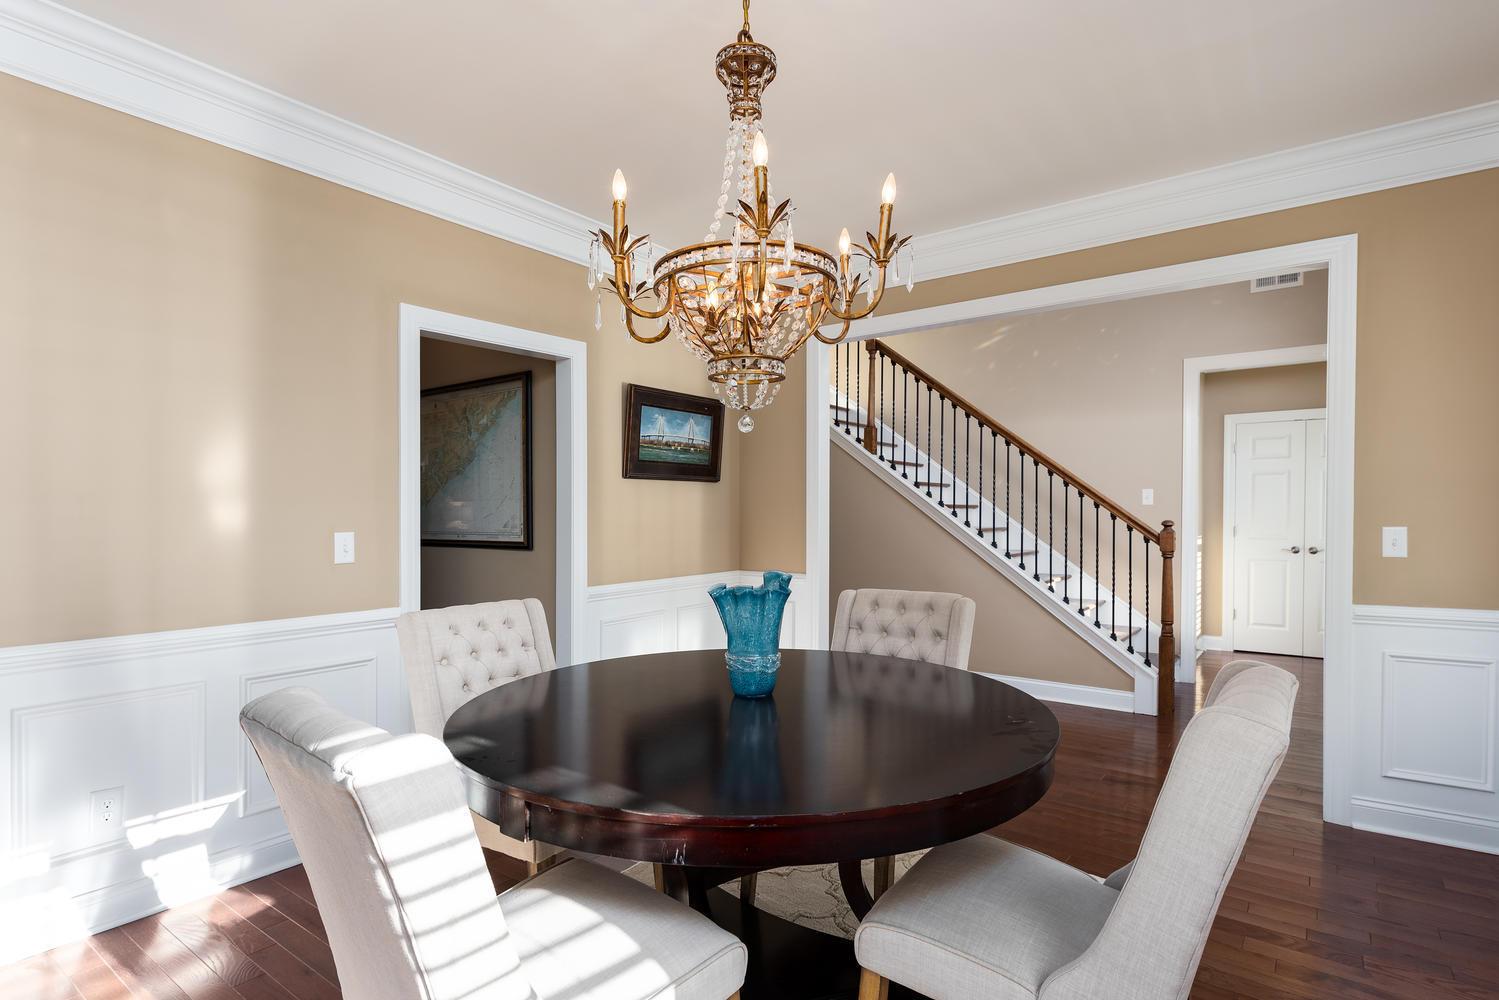 River Reach Pointe Homes For Sale - 1216 Rivers Reach Drive, Charleston, SC - 9